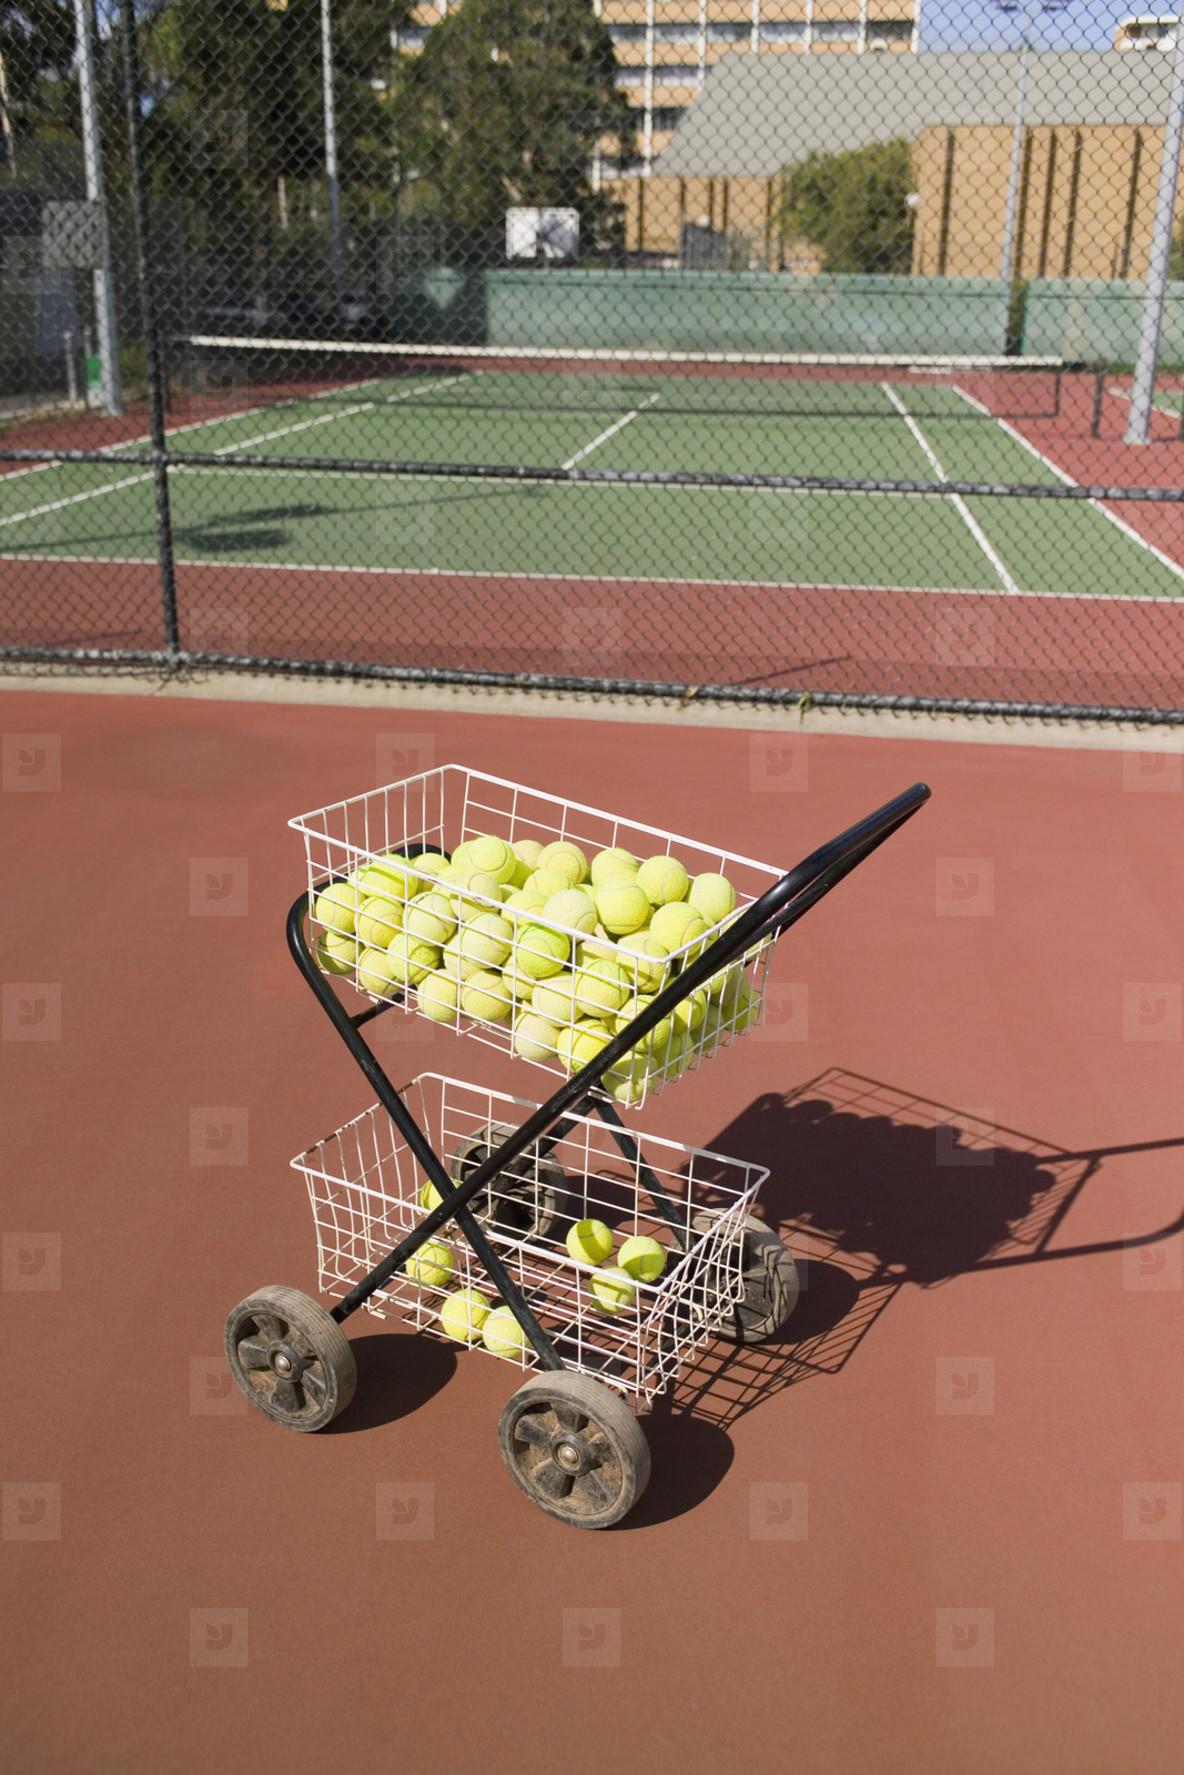 Serious Tennis  11